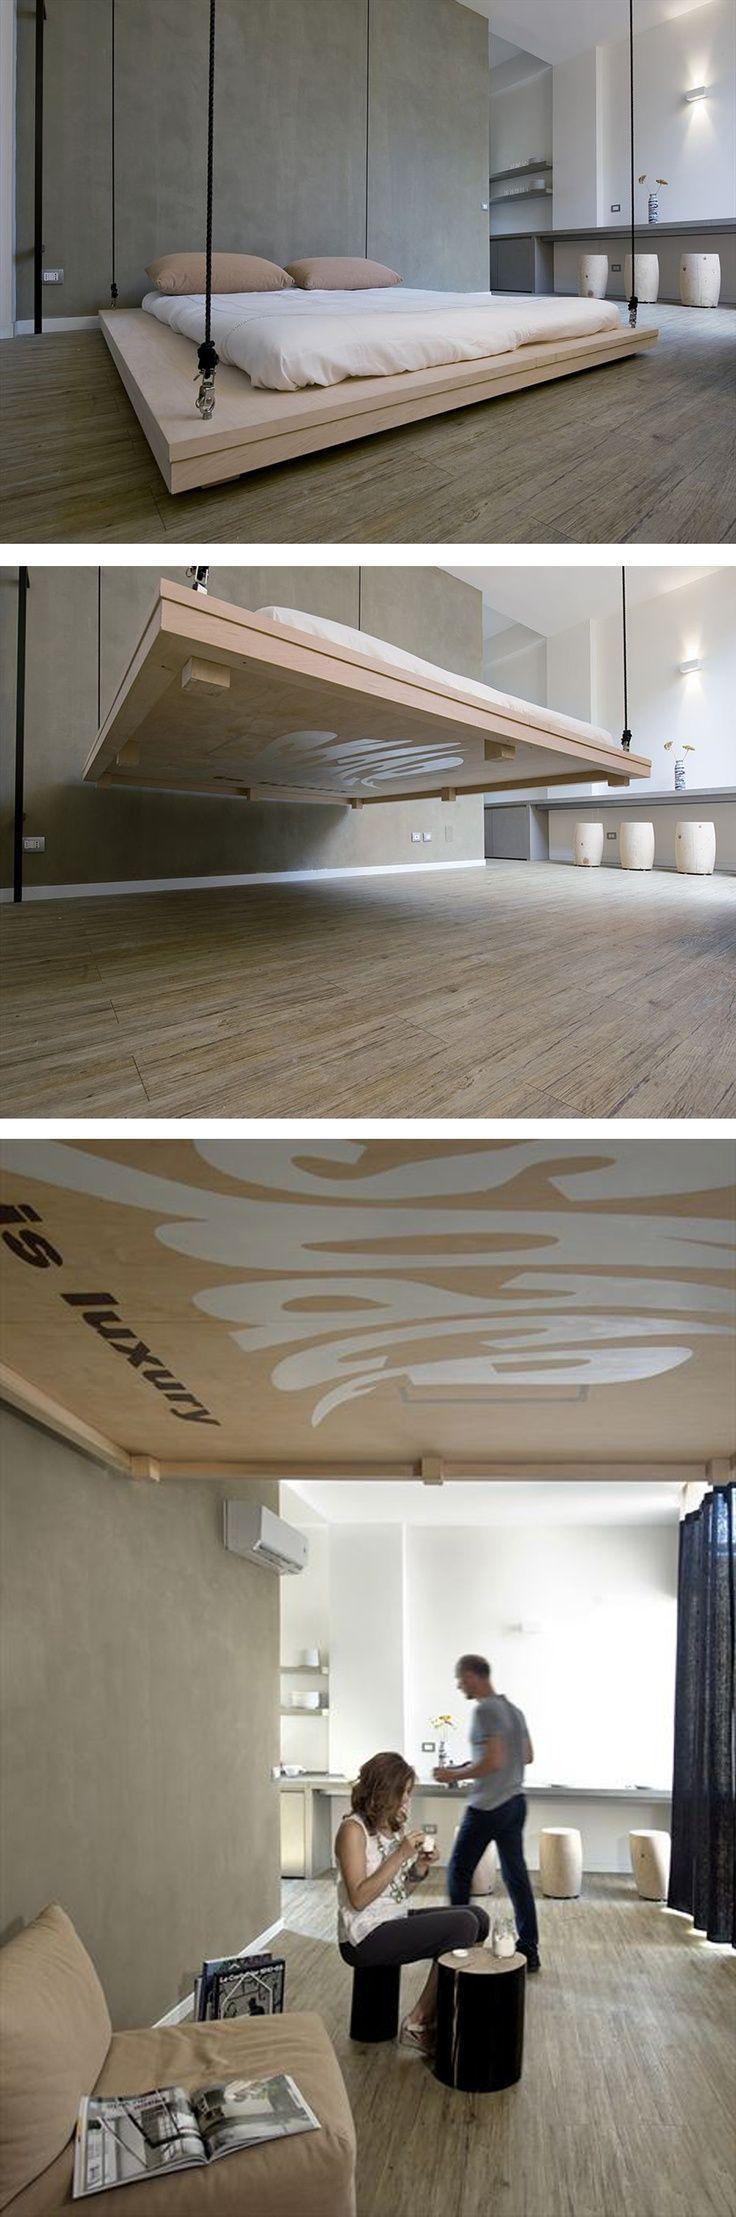 17 meilleures id es propos de chambre avec plafond haut. Black Bedroom Furniture Sets. Home Design Ideas